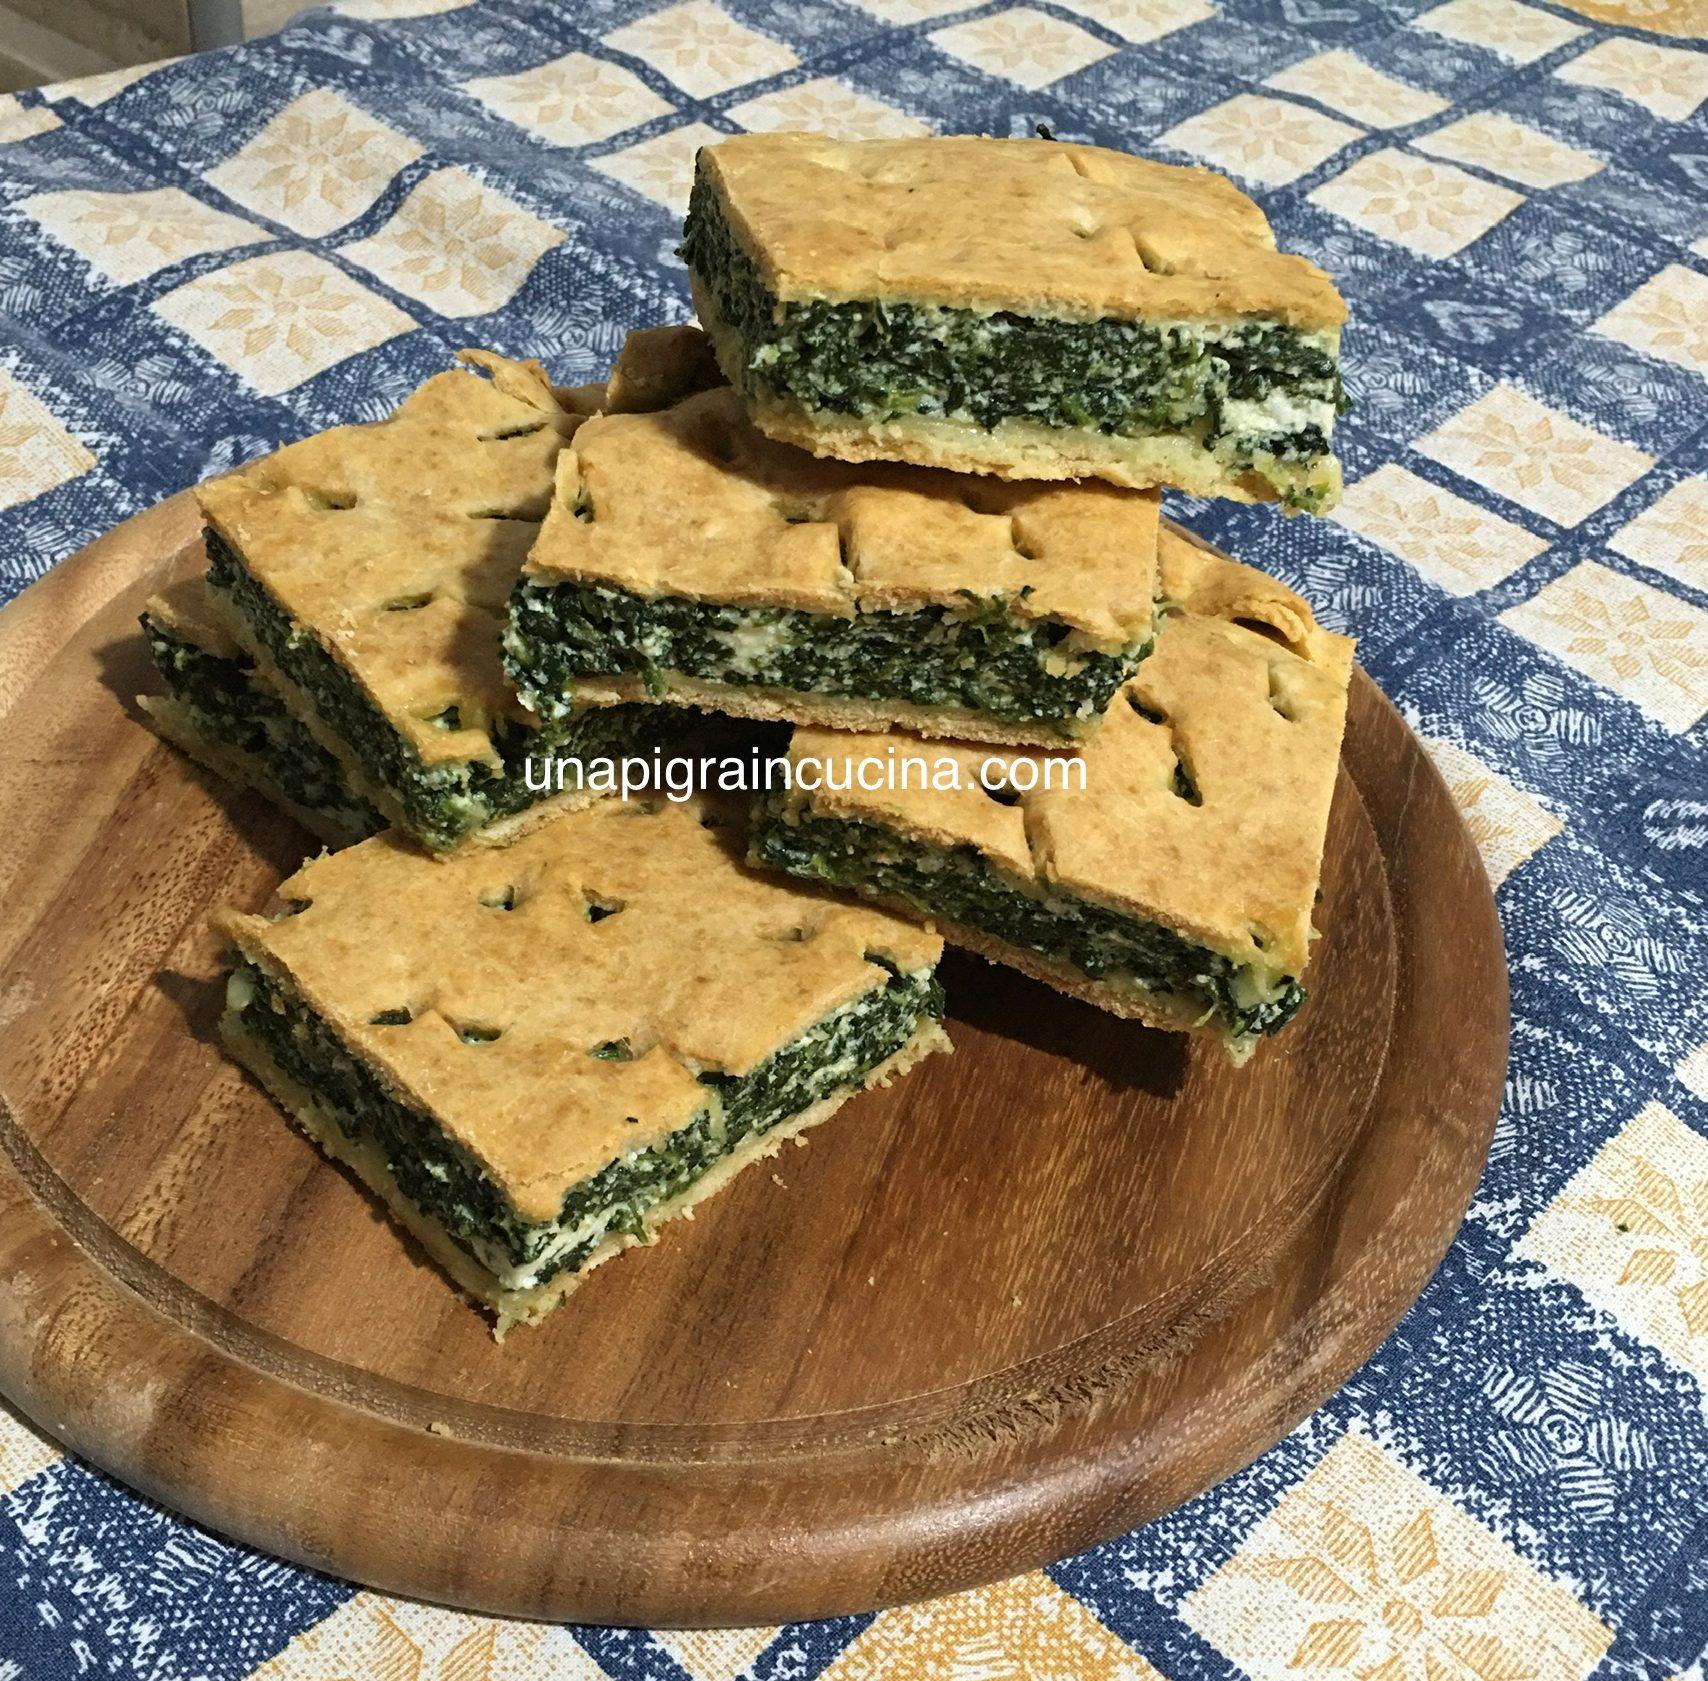 Ricetta Torta Salata Con Spinaci Senza Ricotta.Torta Salata Ricotta E Spinaci Senza Lievito Di Birra